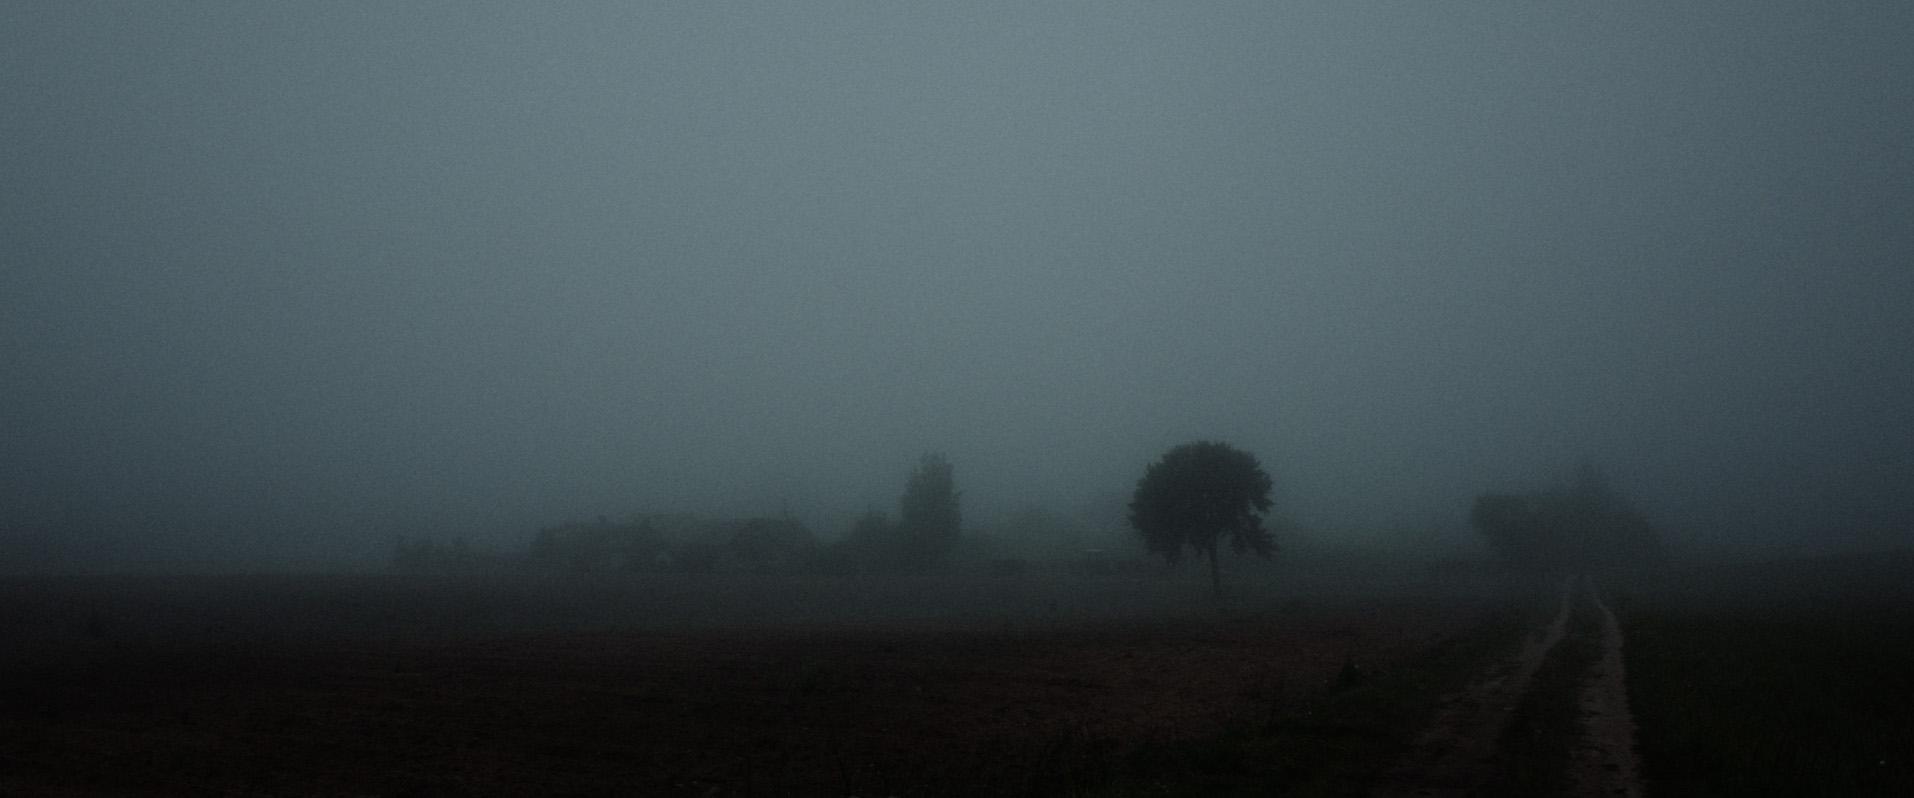 field fog by jevgenij tichonov.jpg